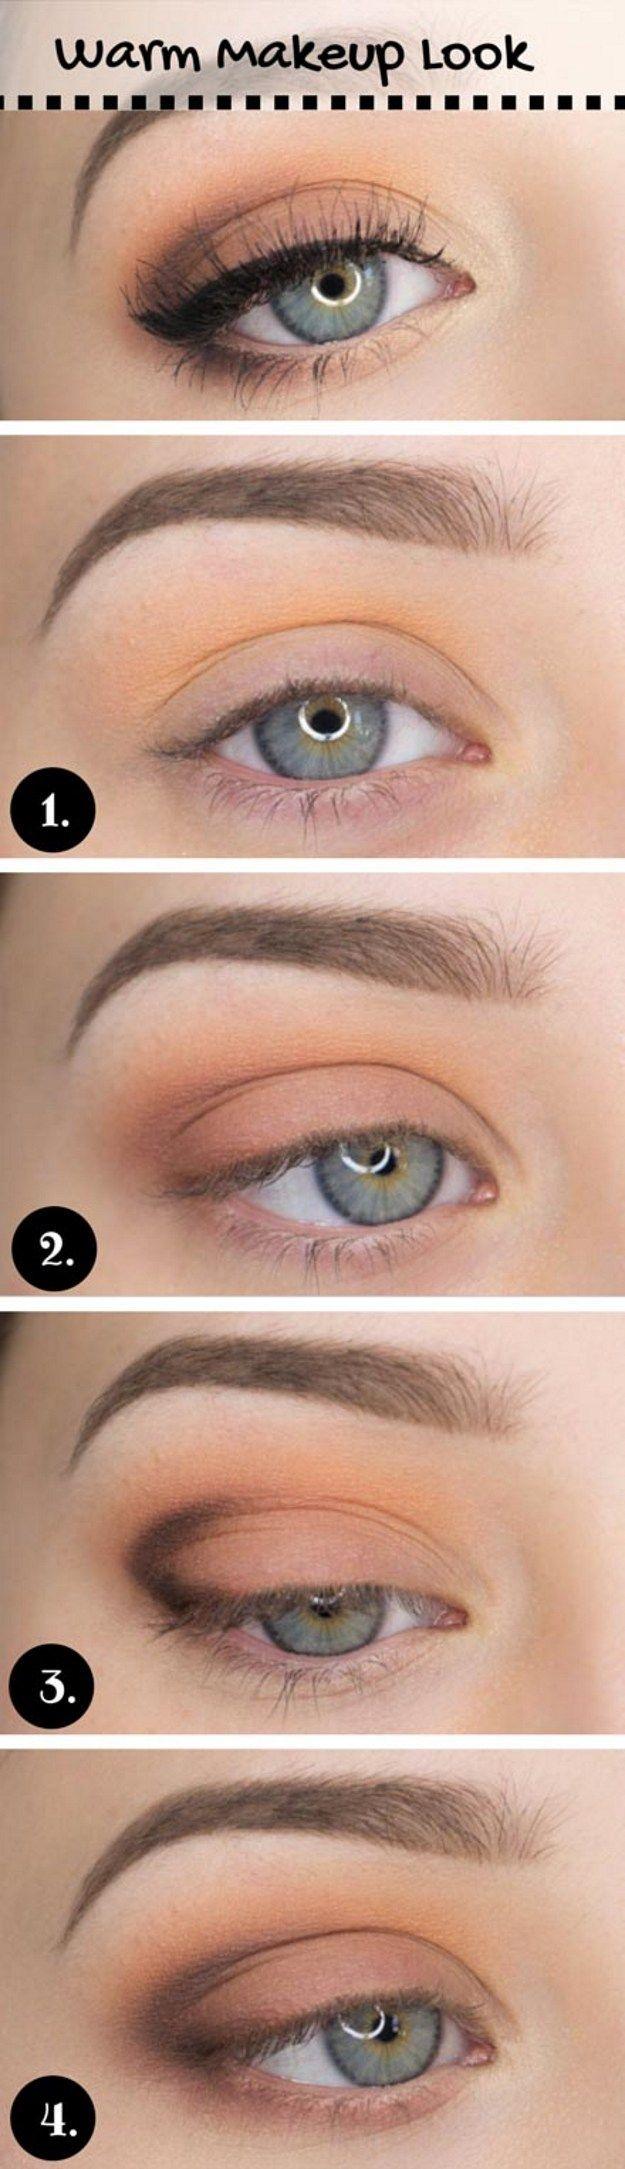 How to Do Casual Makeup Look   Everyday Makeup by Makeup Tutorials at www.makeup...